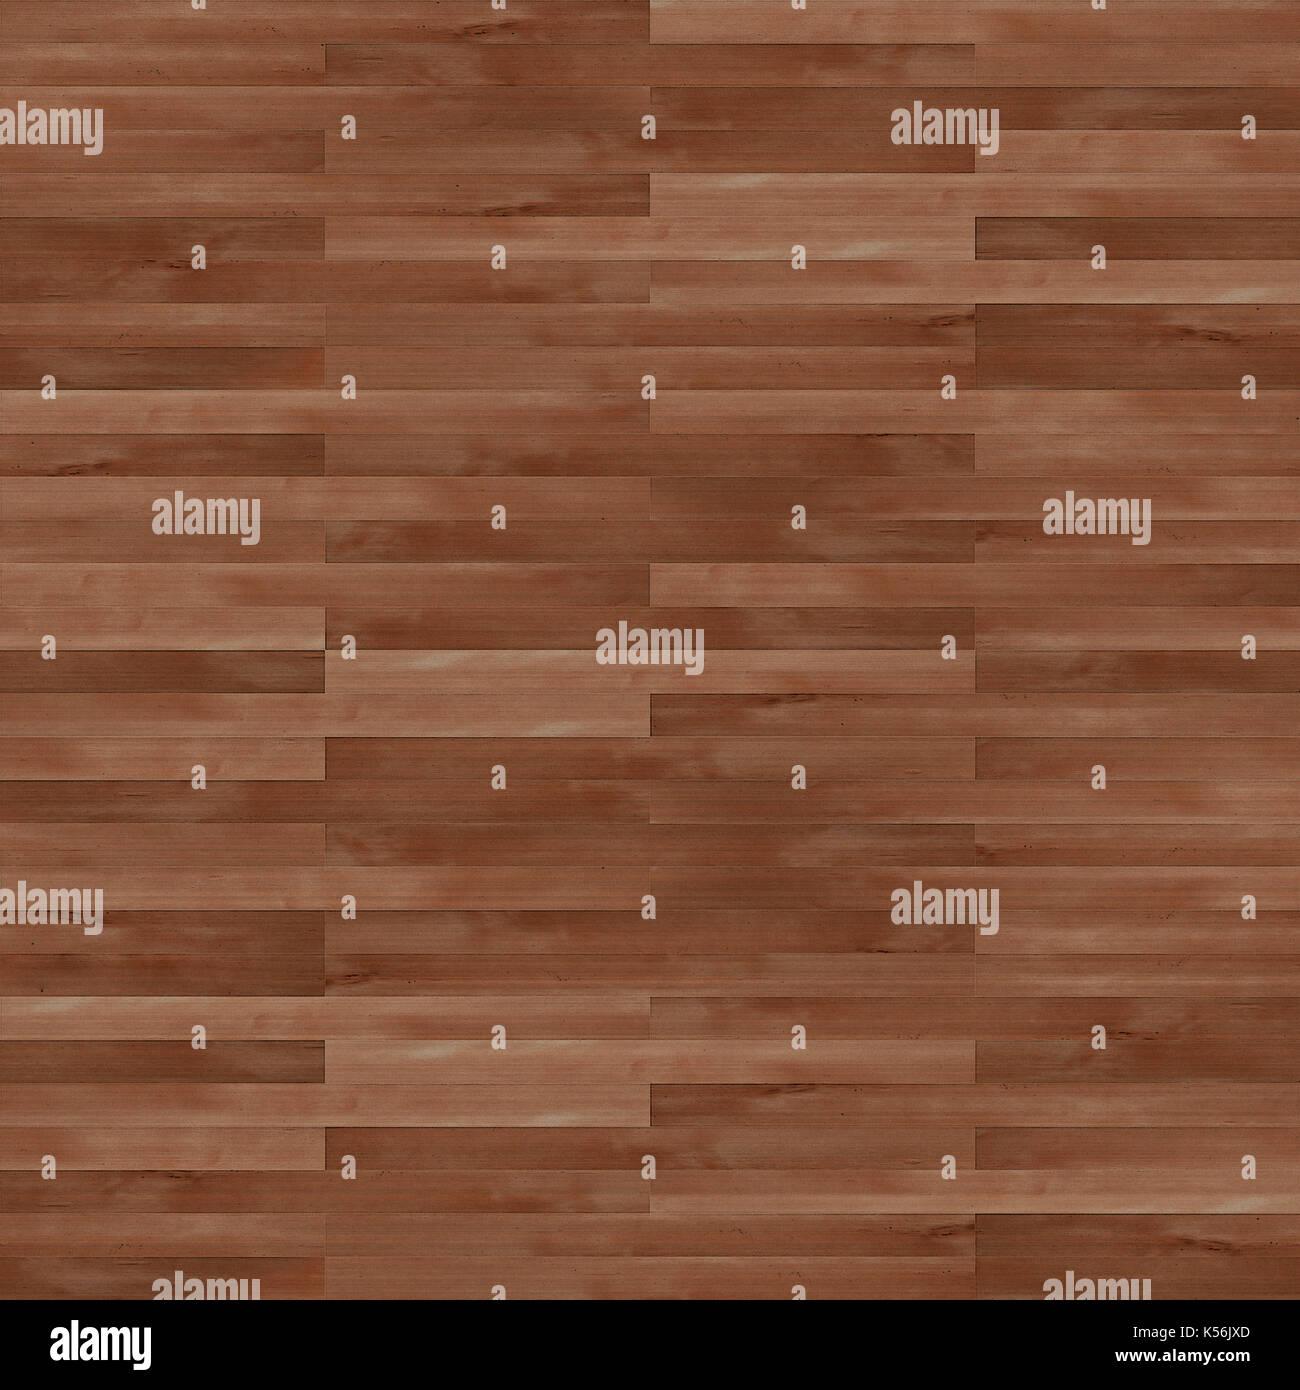 Seamless parquet board - Stock Image